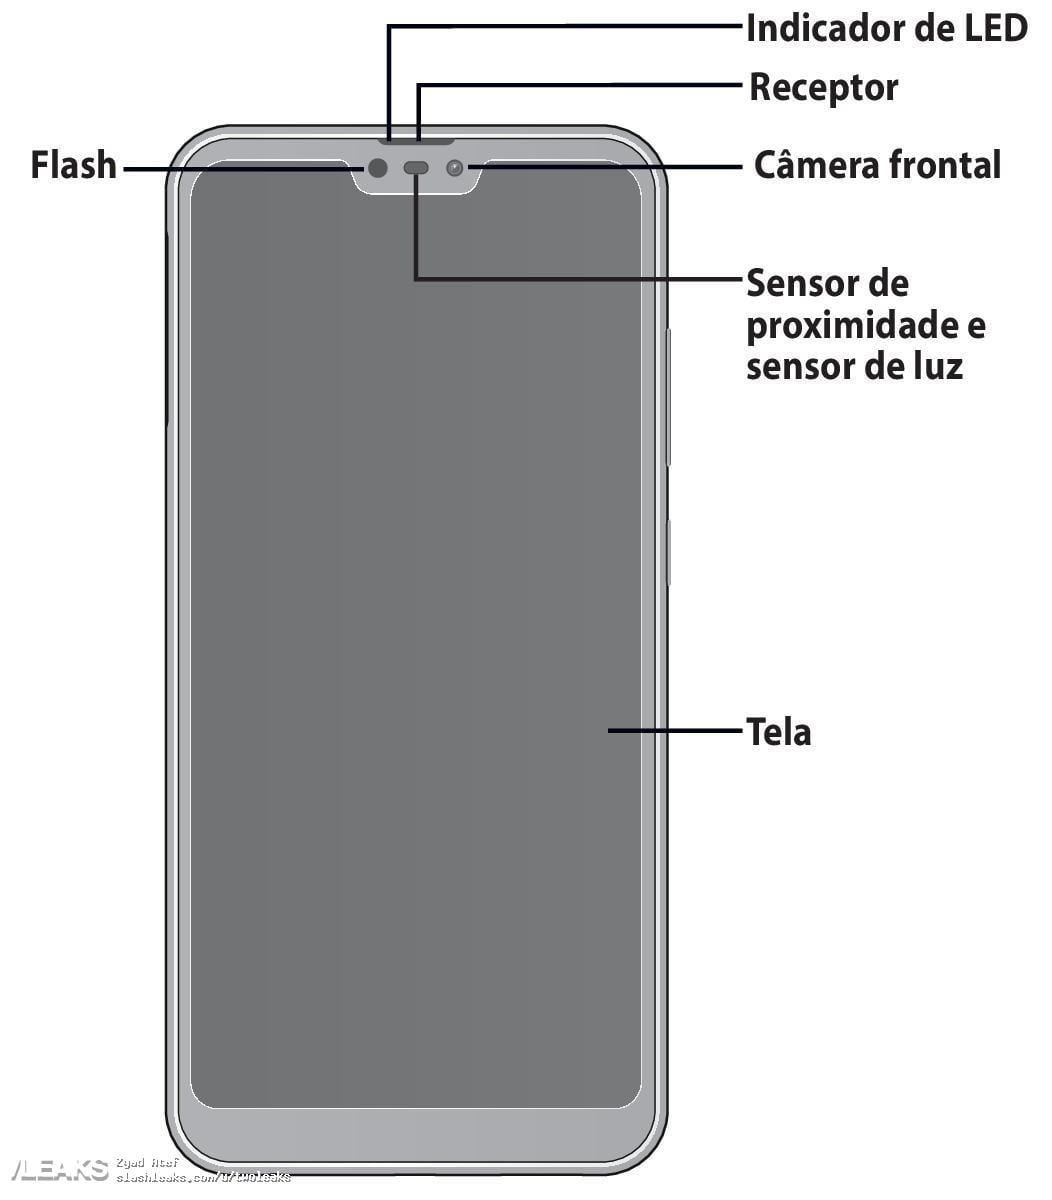 Asus Zenfone Max Plus M2 & Zenfone Max Shot design leaks via ANATEL 2